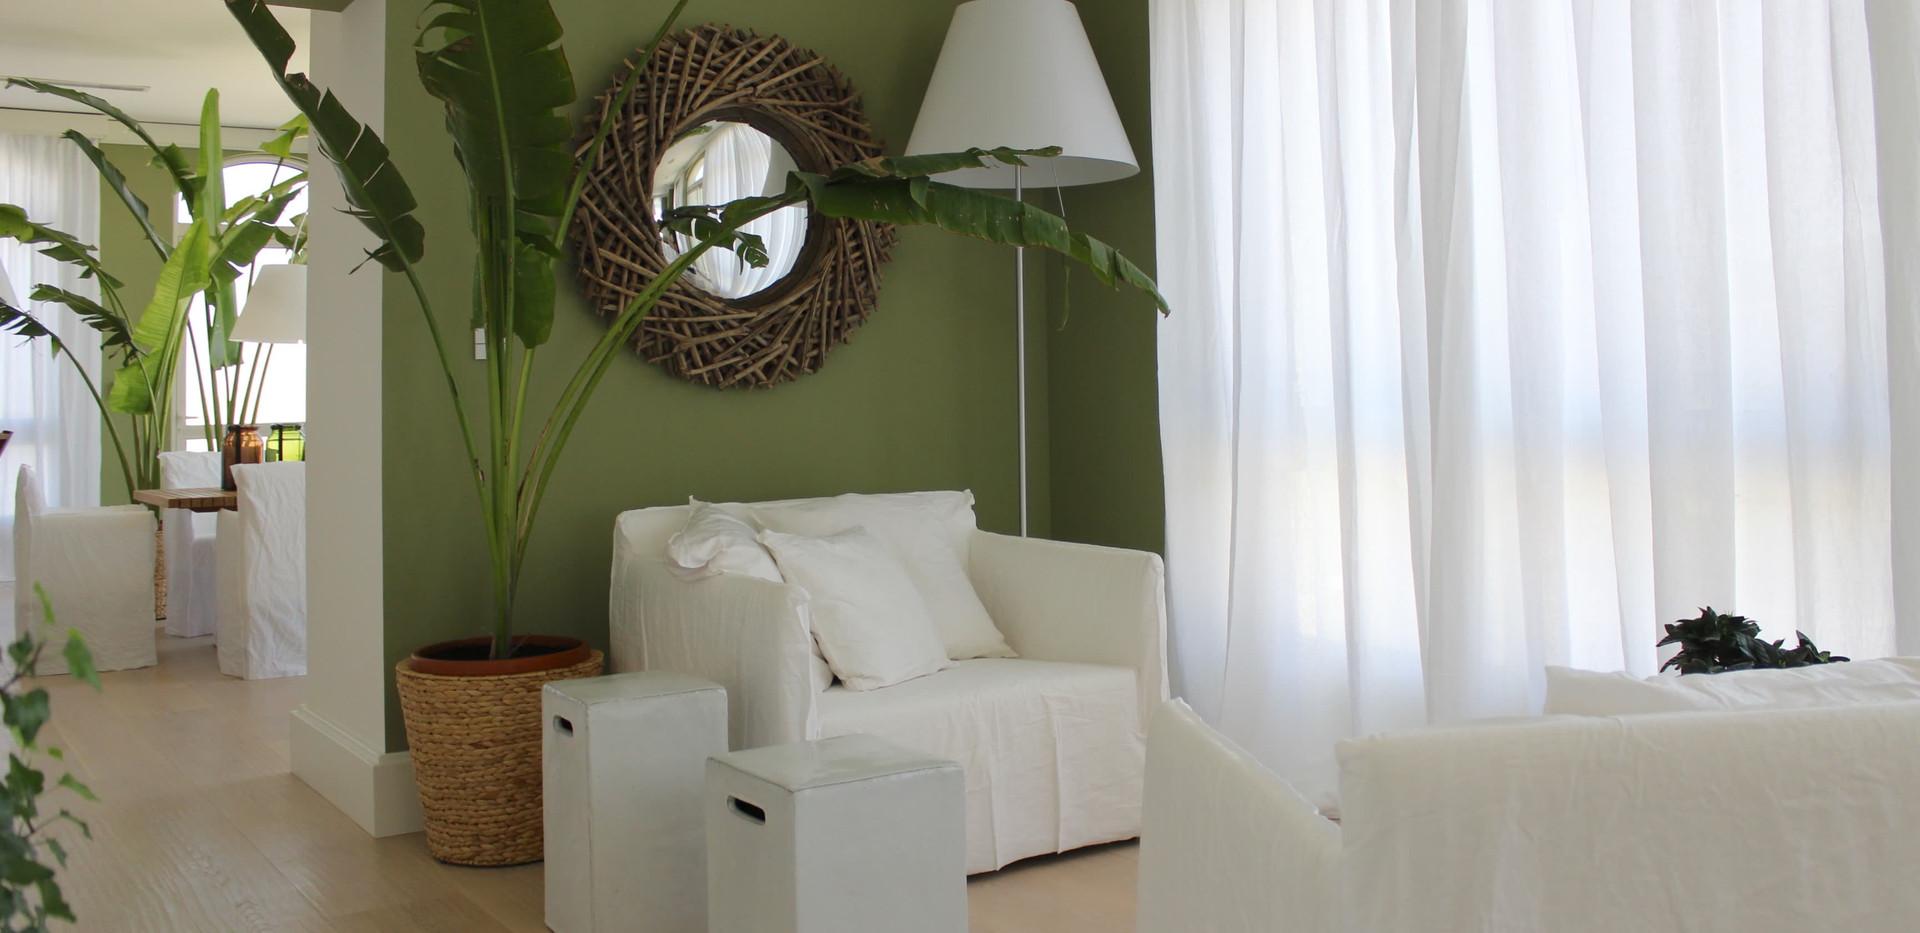 Classicismo Contemporaneo - Ernesto Fusco Interior Designm .jpg